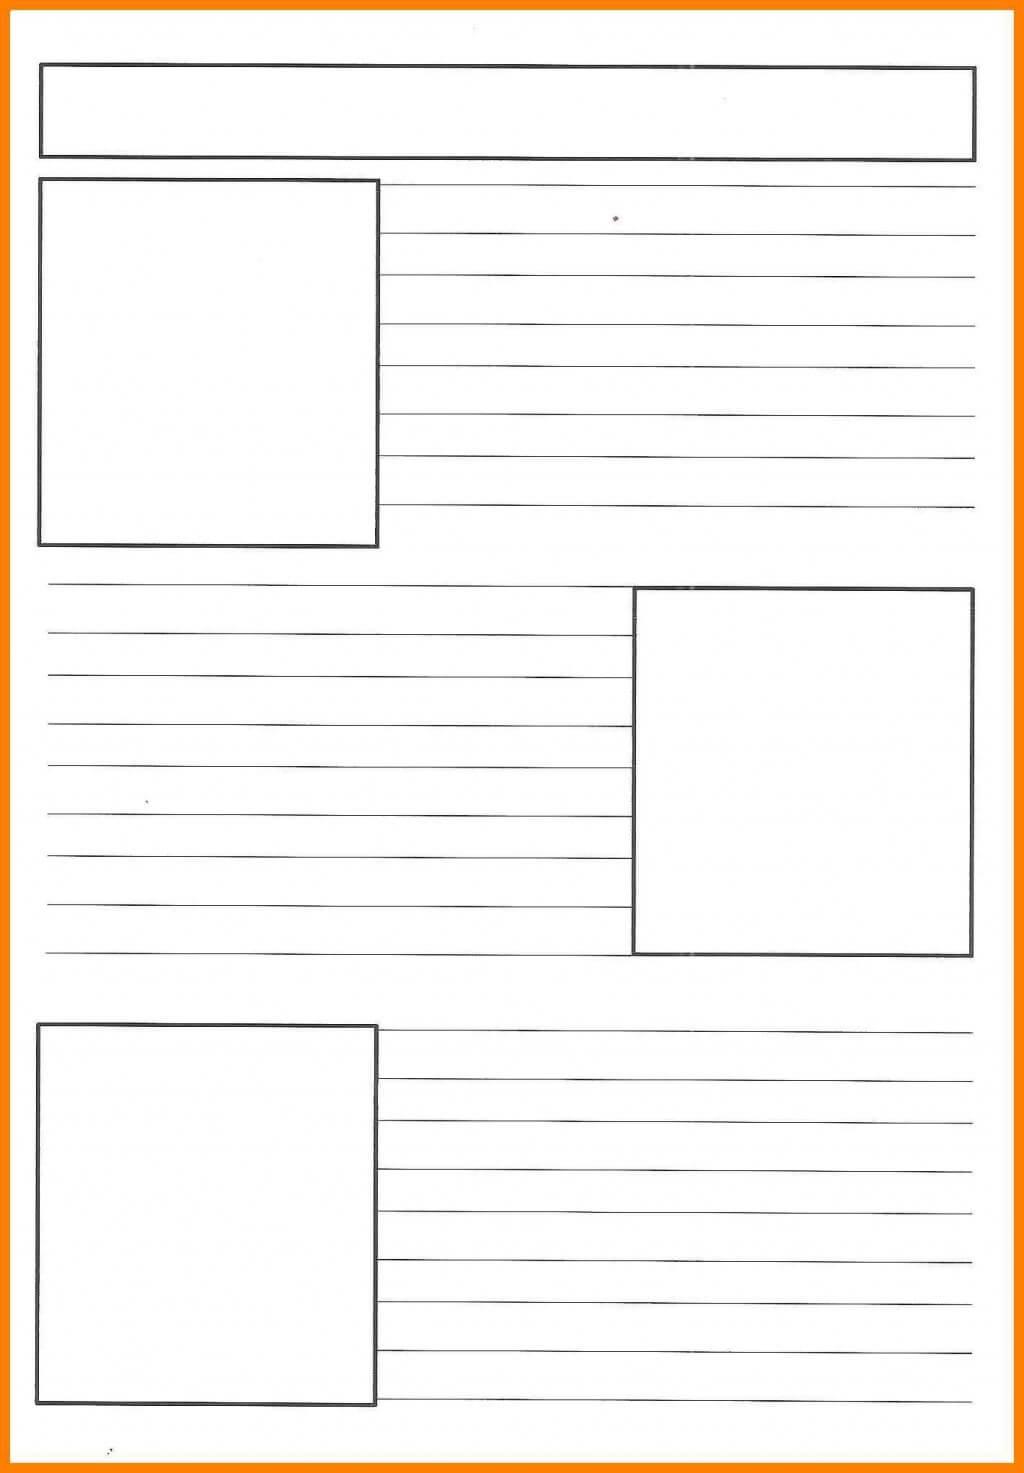 Impressive Printable Newspaper Template Word Application Inside Blank Newspaper Template For Word